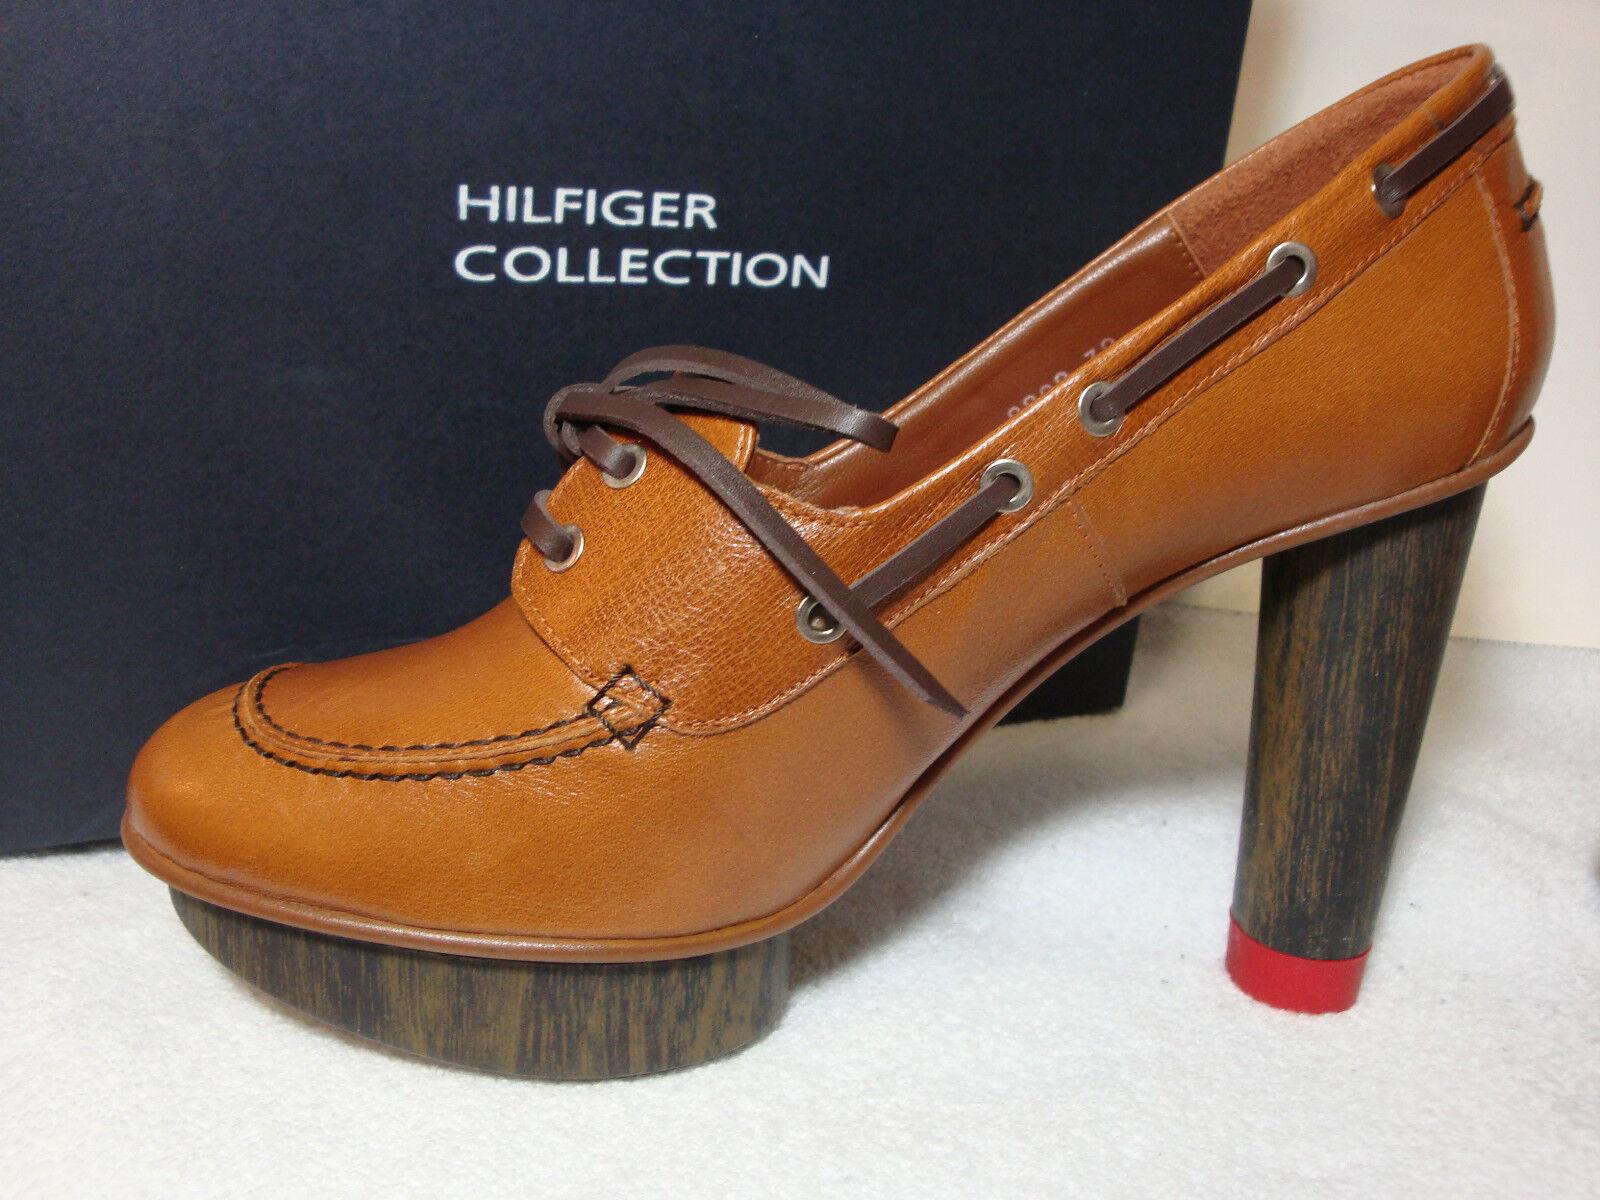 Hilfiger Collection Solid Brown Leather Platform 4  High Pumps Stilettos 39 M